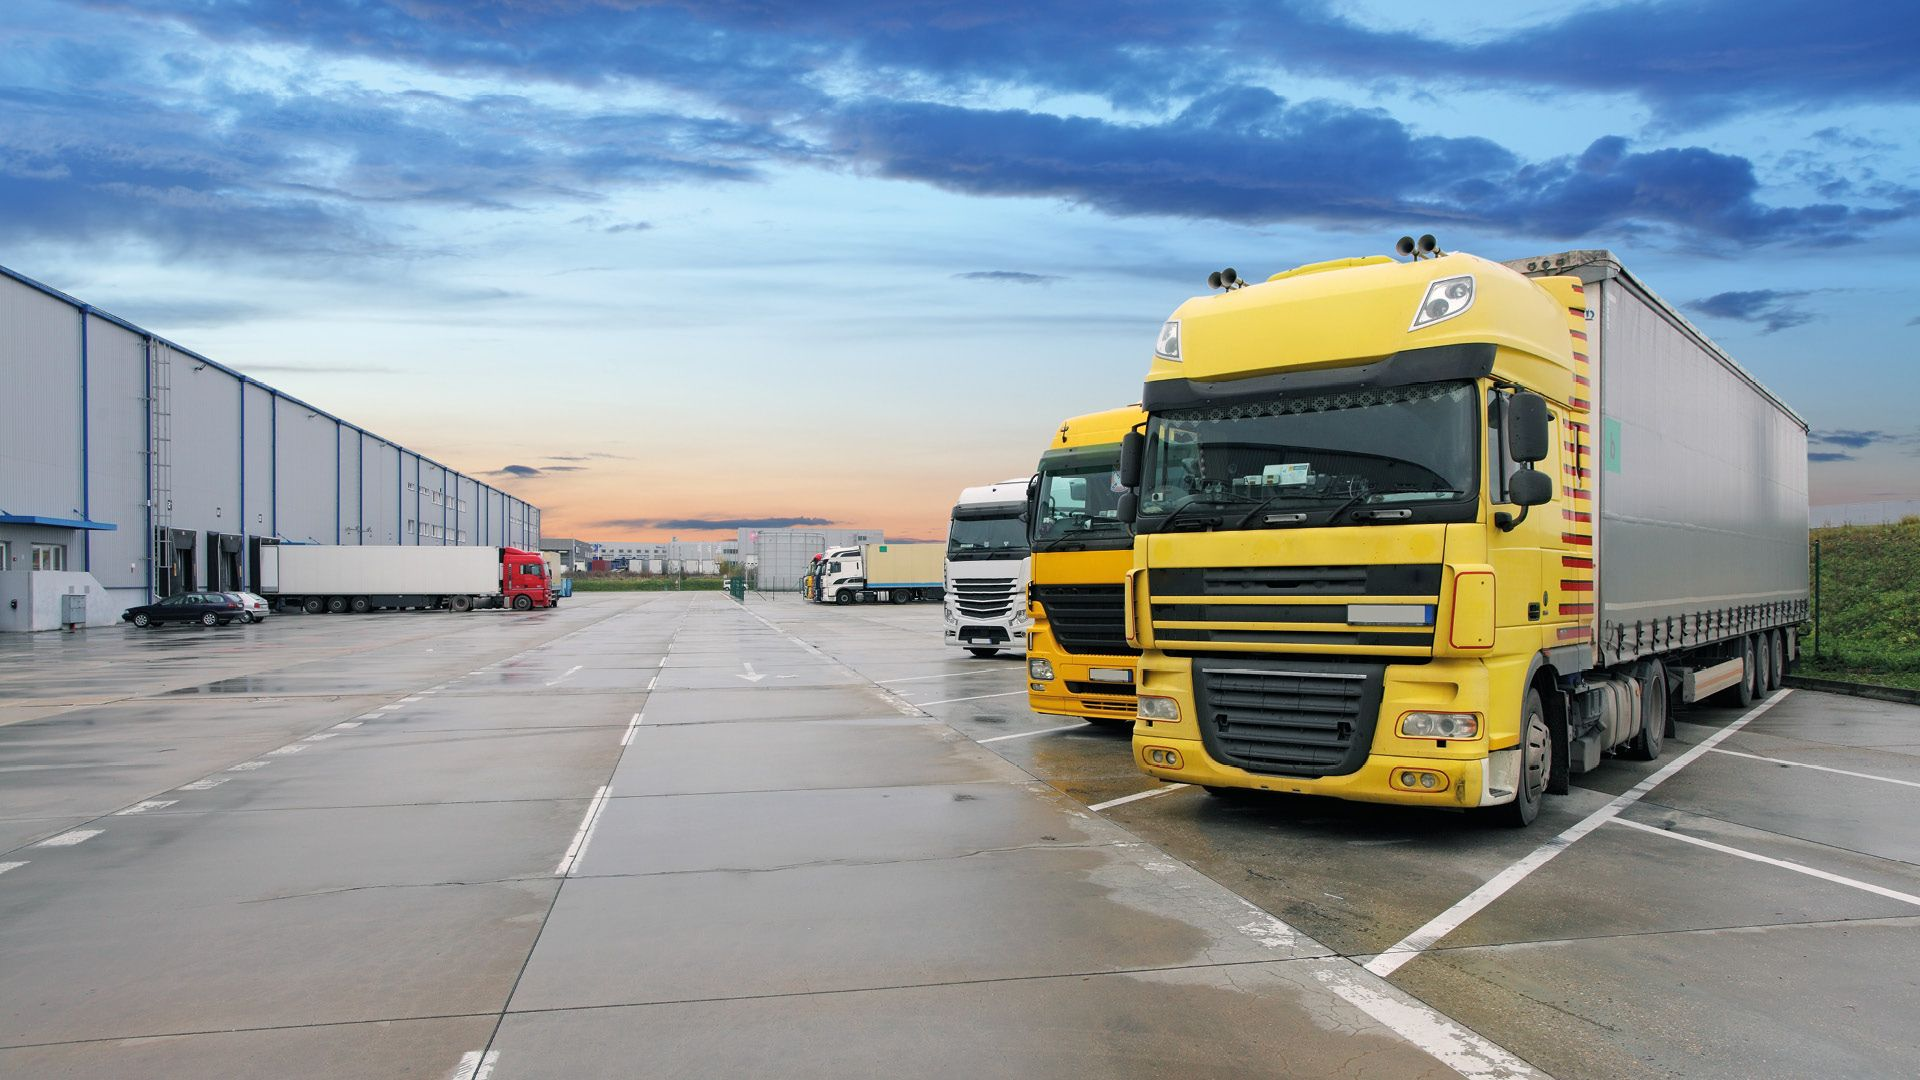 Sluyter Image of Trucks Parked at Terminal